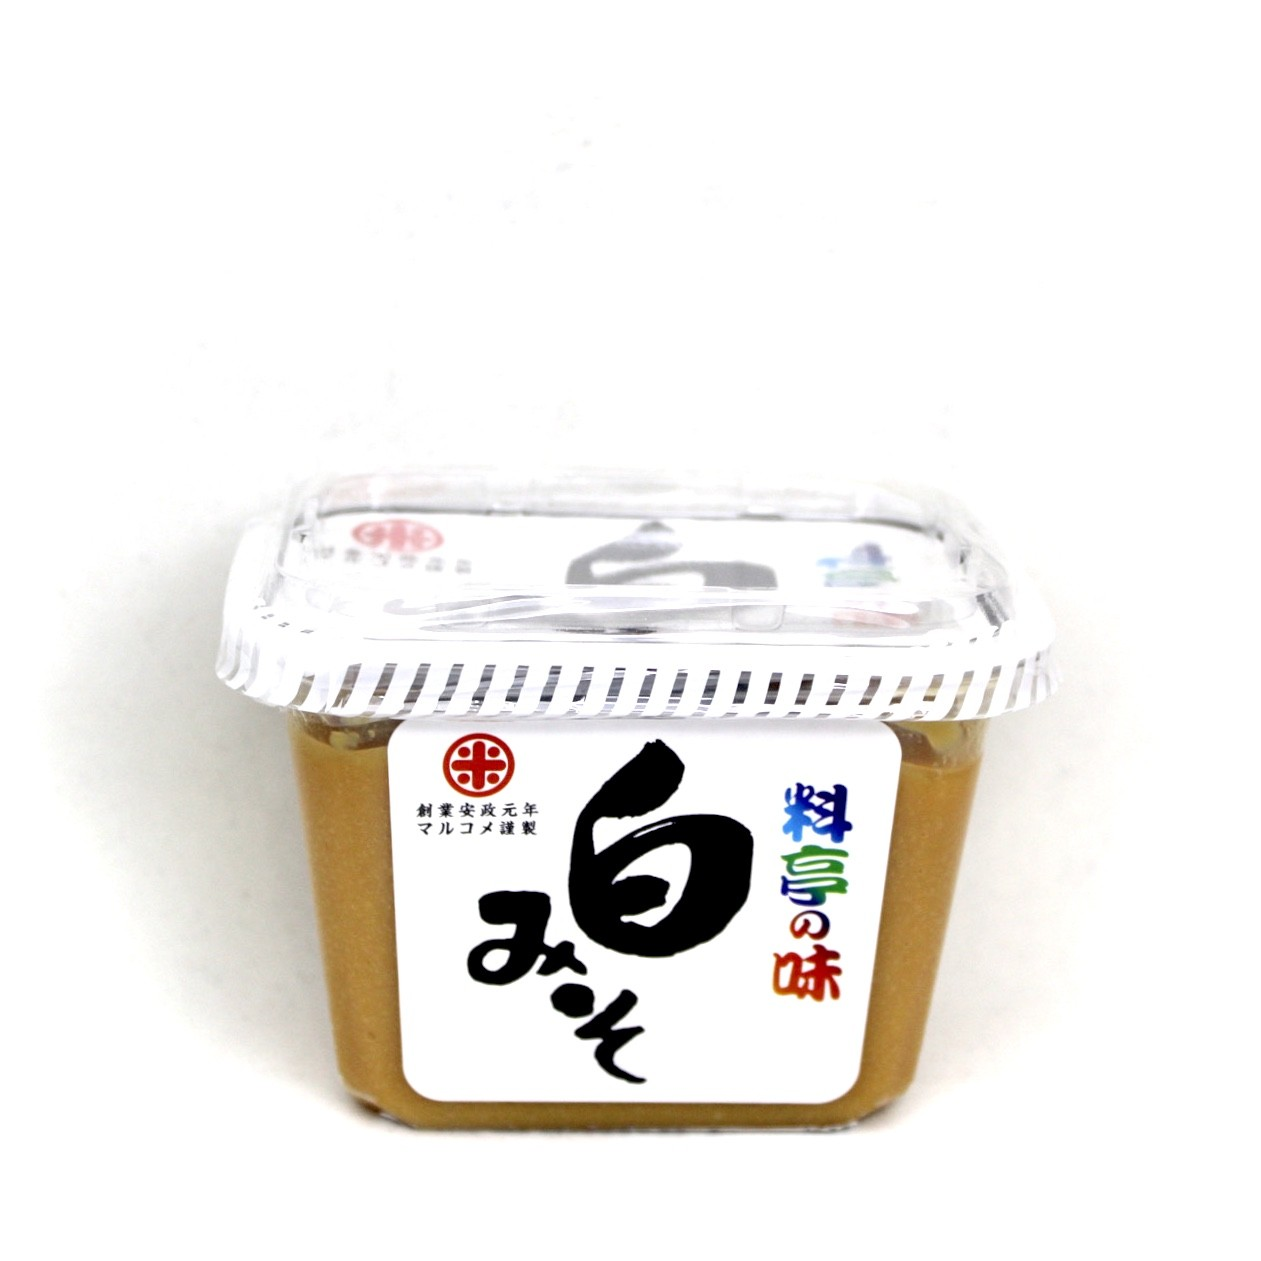 MARUKOME MISSO RYOUTEI SHIRO MISSO 375g